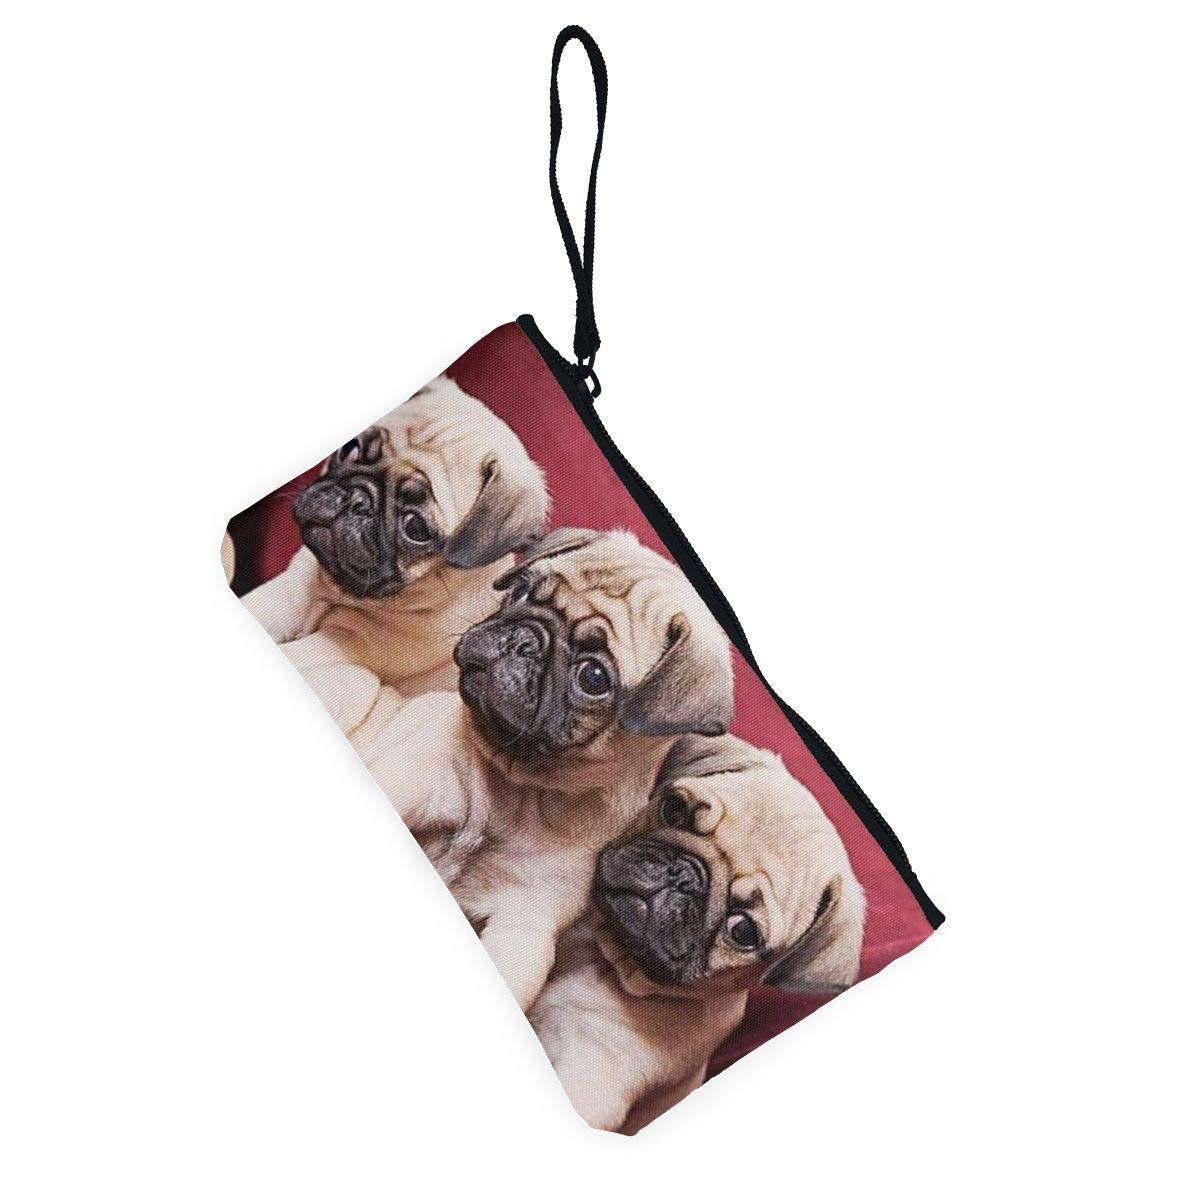 Deepouder Pugs Zipper Canvas Coin Purse Wallet Make Up Bag,Cellphone Bag With Handle